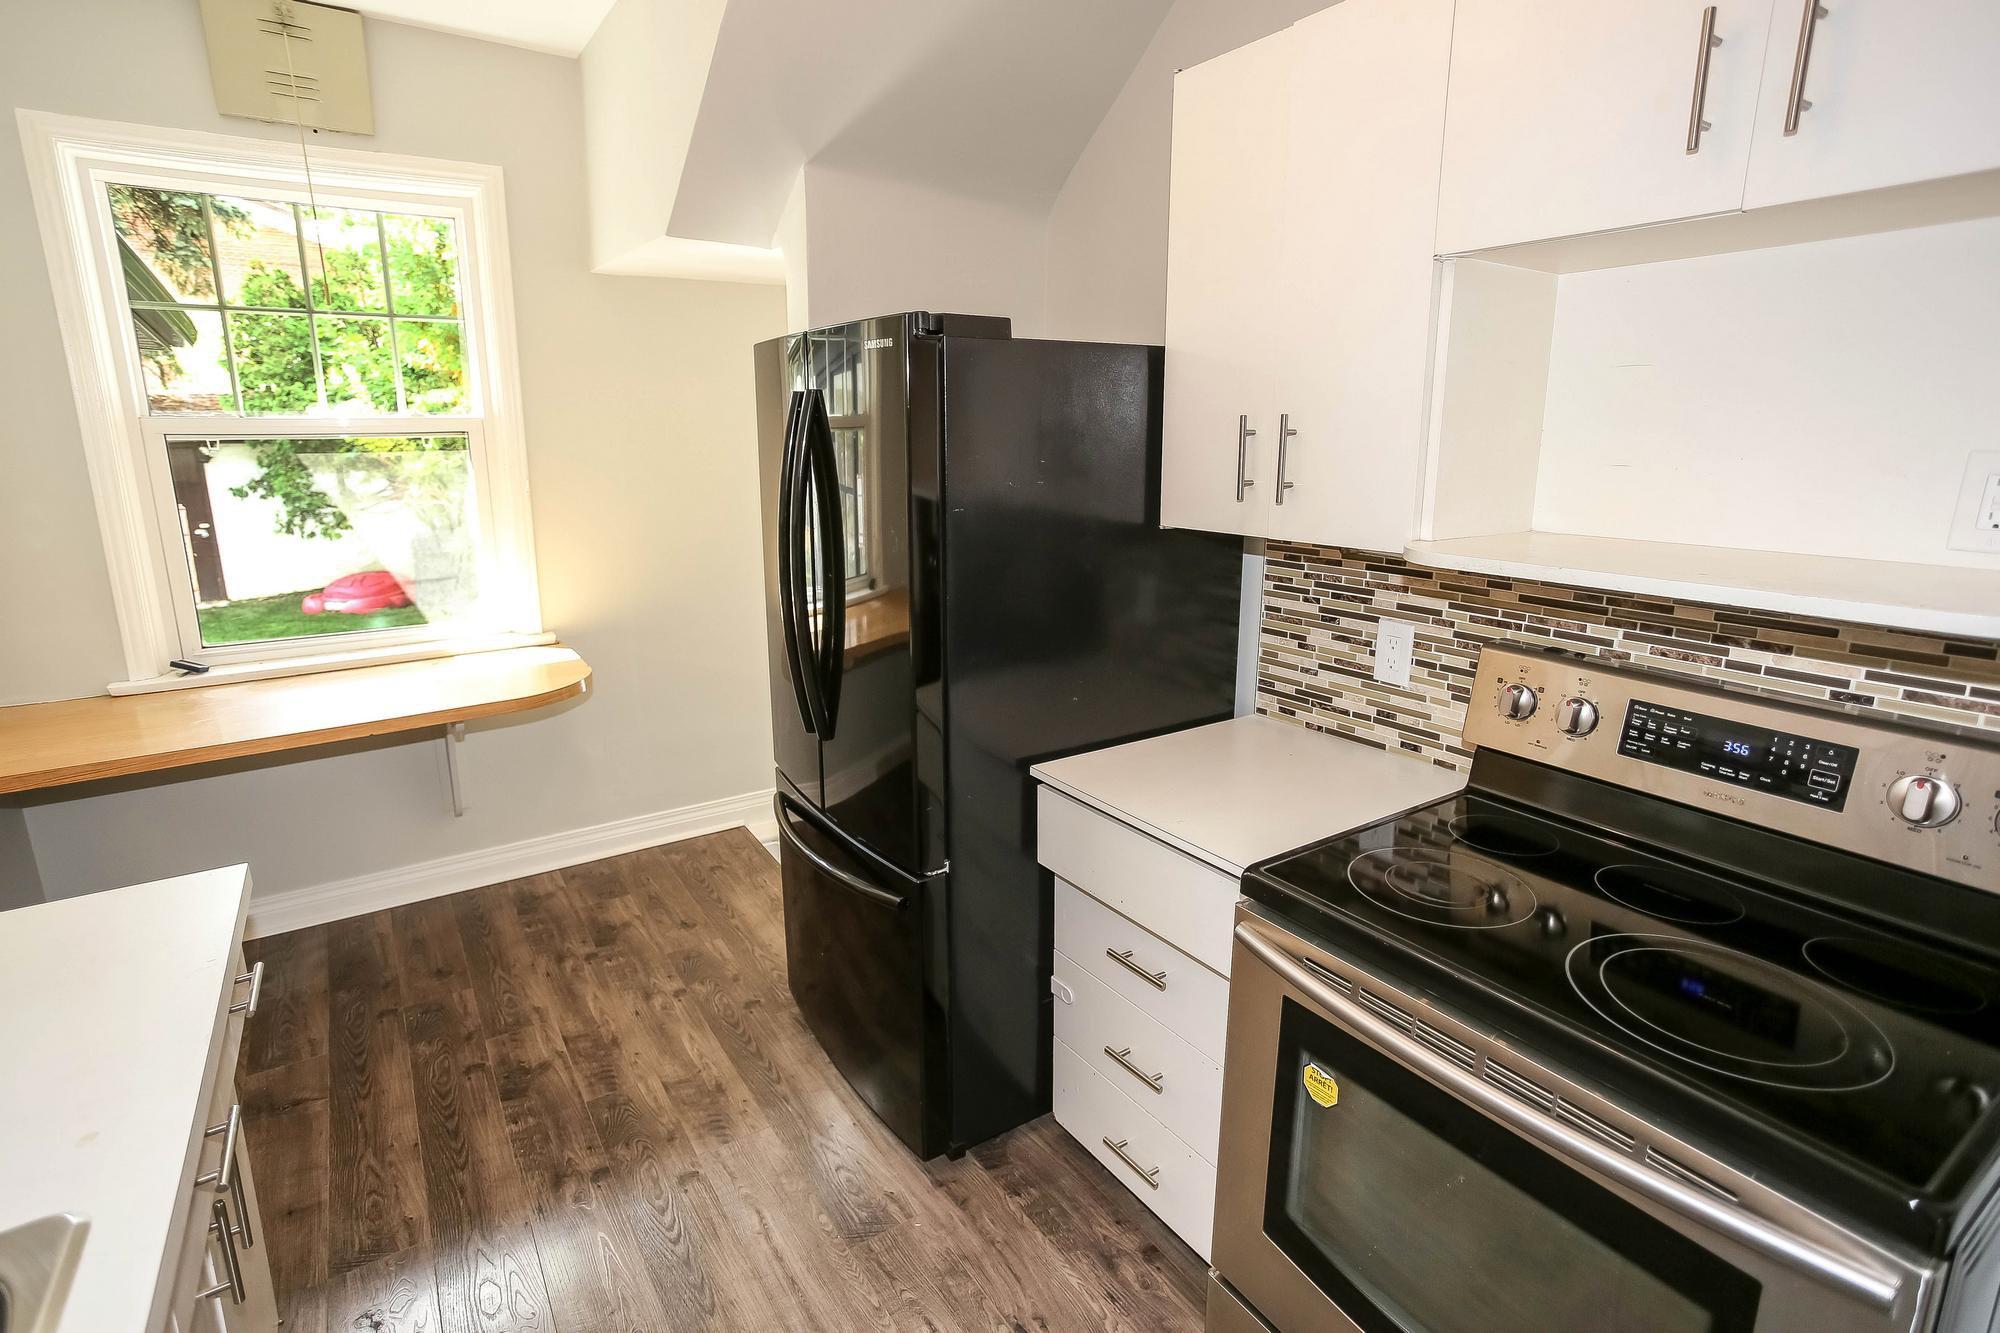 Photo 13: Photos: 155 Borebank Street in Winnipeg: River Heights Single Family Detached for sale (1C)  : MLS®# 202017166